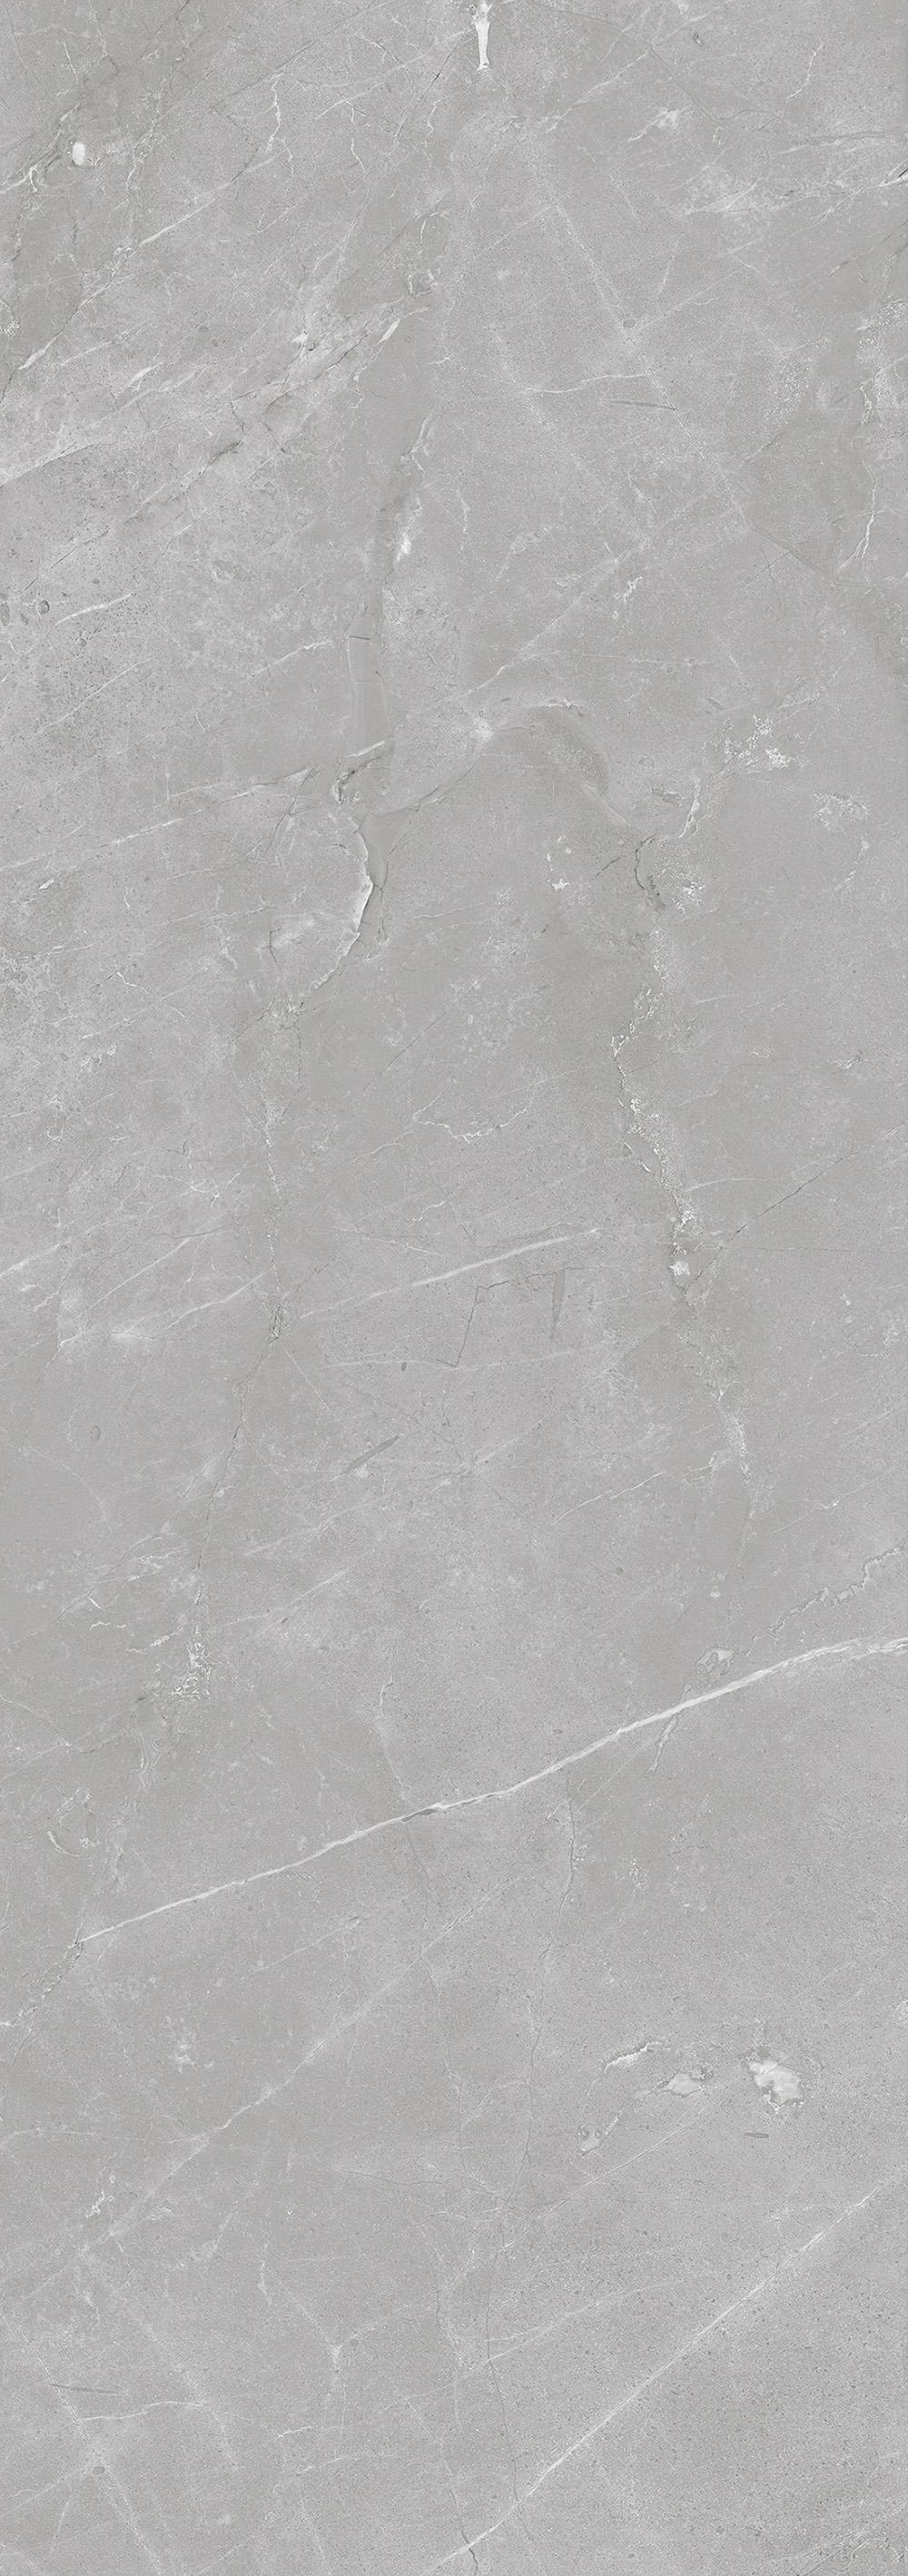 HJ260919-1CY灰色印象